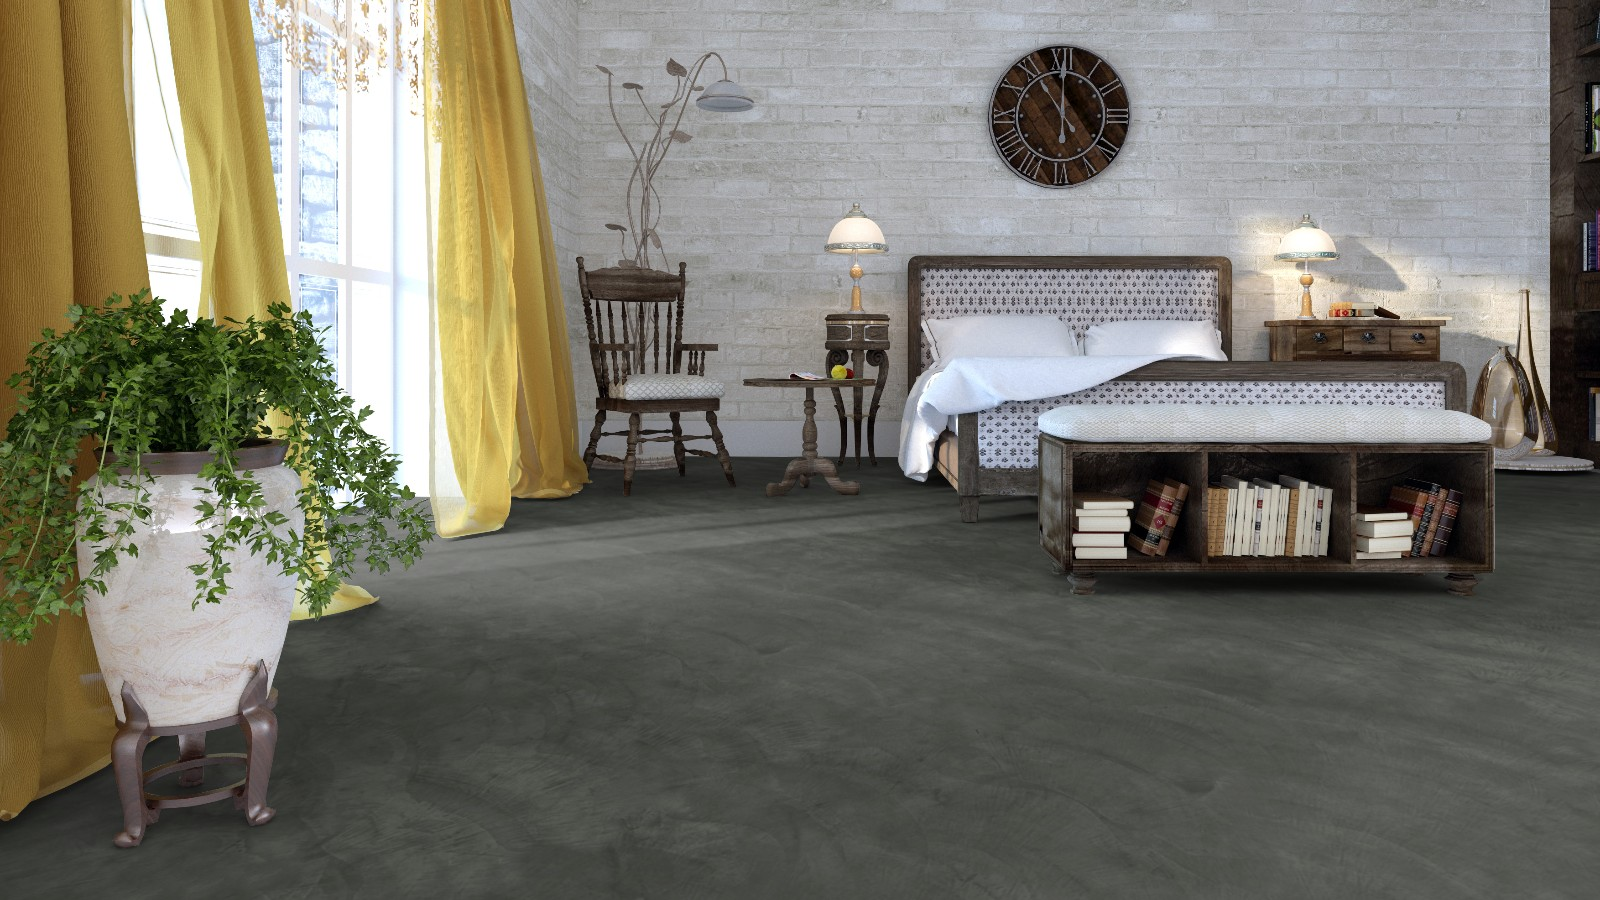 Slaapkamer Betonnen Vloer : Beton ciré vloer beton ciré centrum